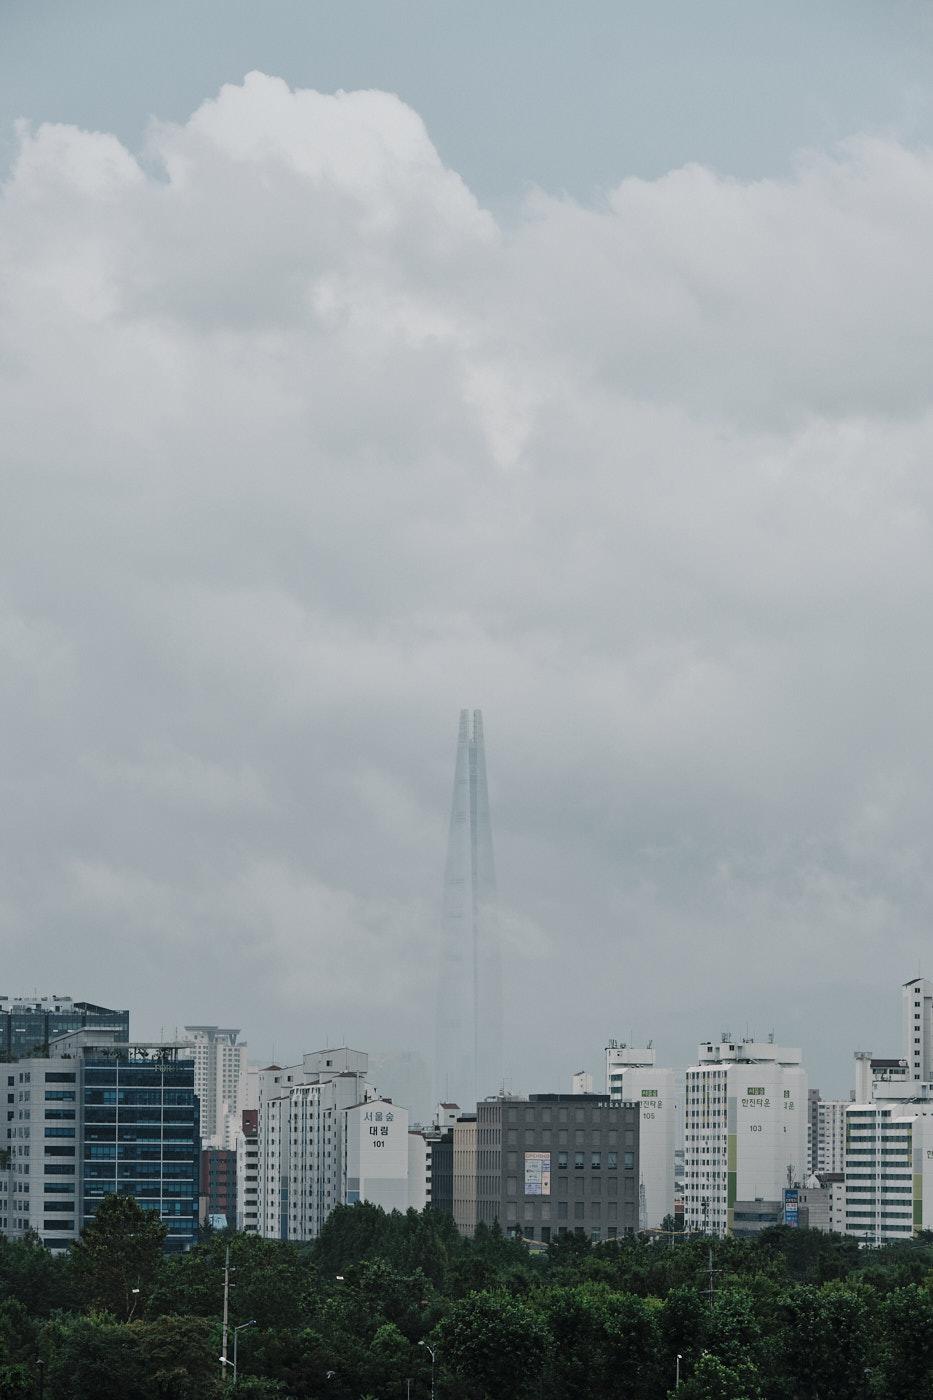 Lotte Tower - Seoul Floods 2020